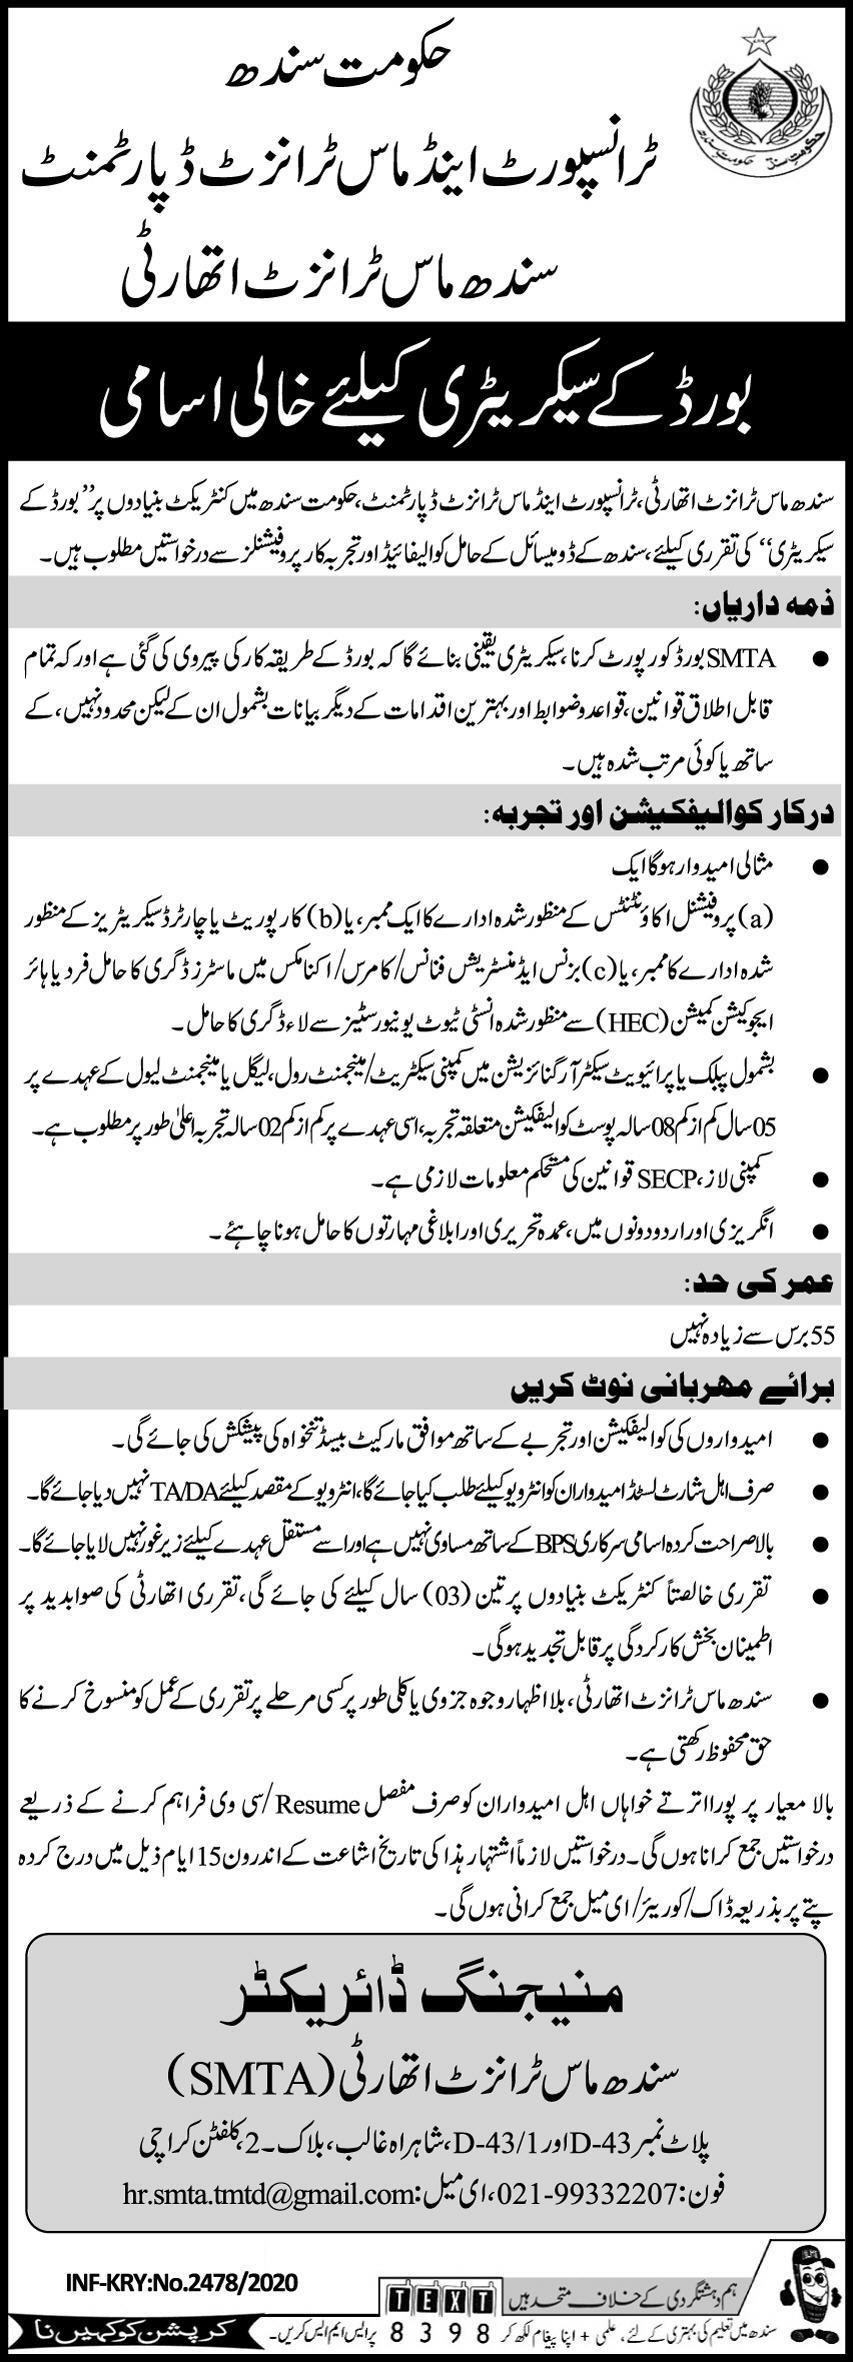 Sindh Mass Transit Authority Transport & Mass Transit Department Jobs September 2020